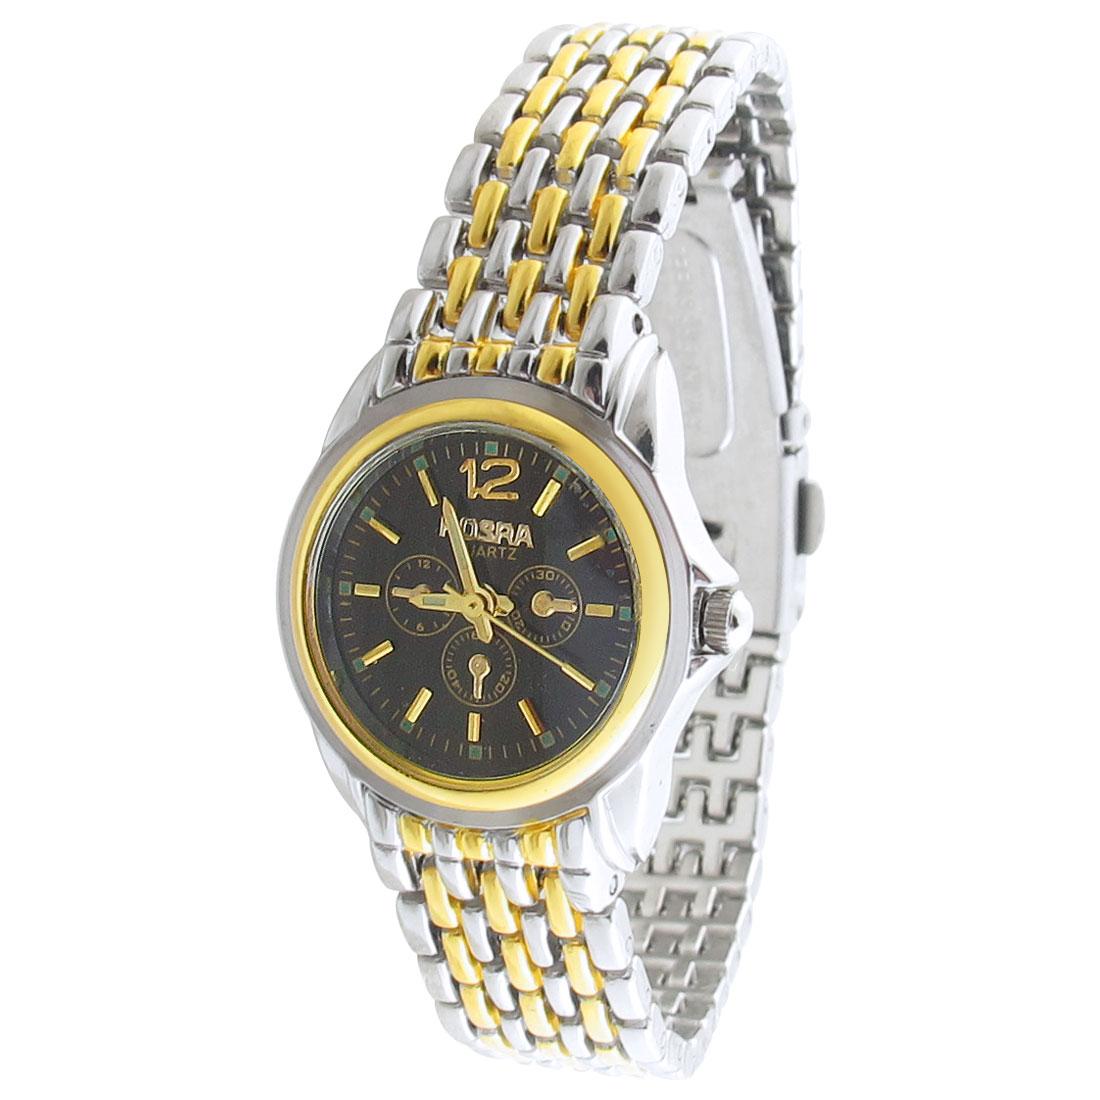 Ladies Black Round Dial Two Tone Watchband Quartz Watch Gift